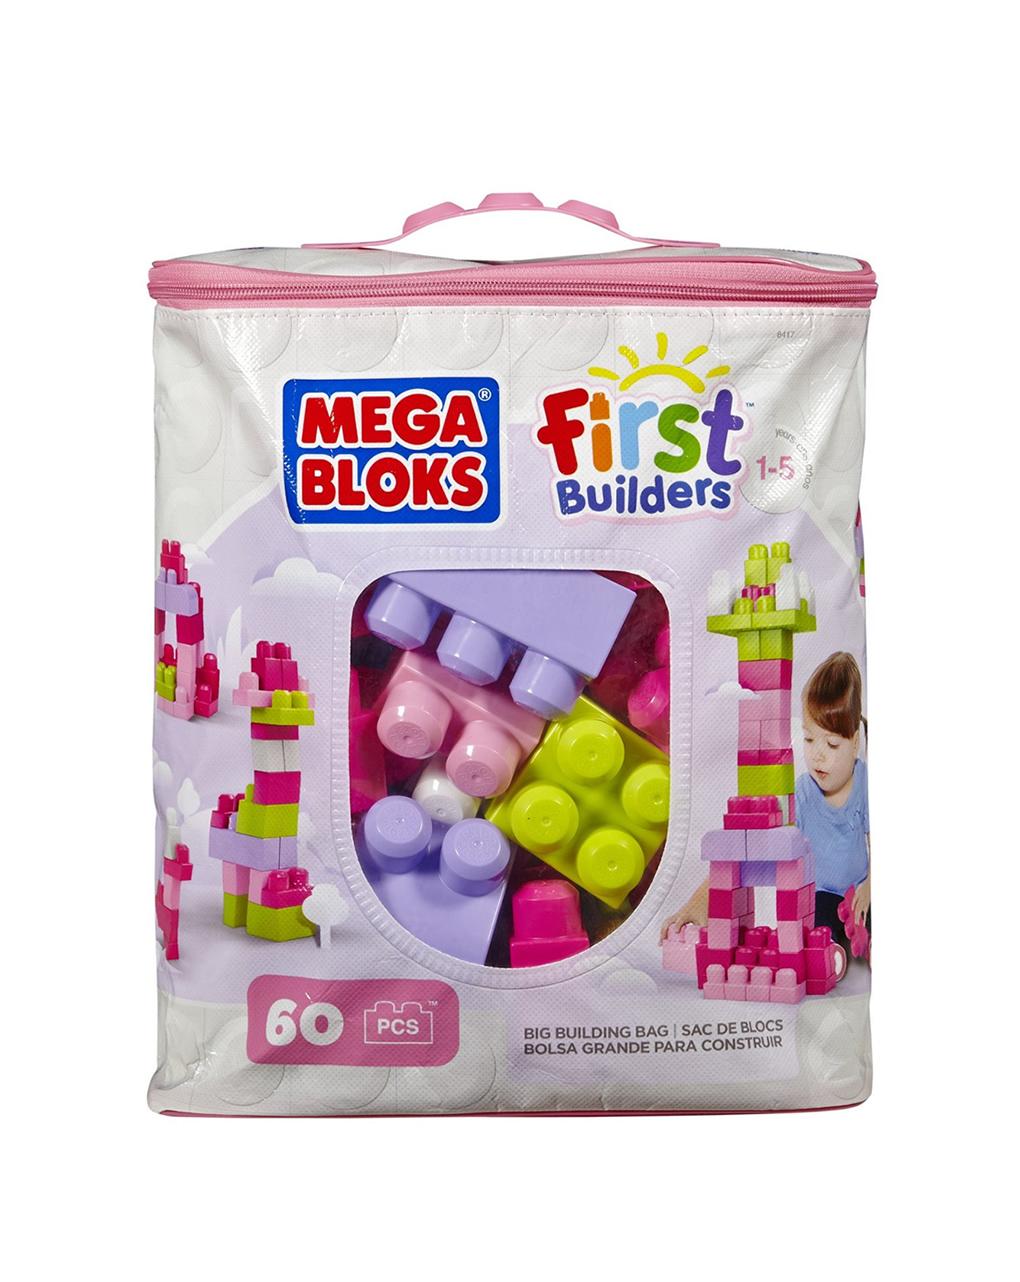 Mega bloks - sacca bio 60 blocchi da costruzione - Mega bloks